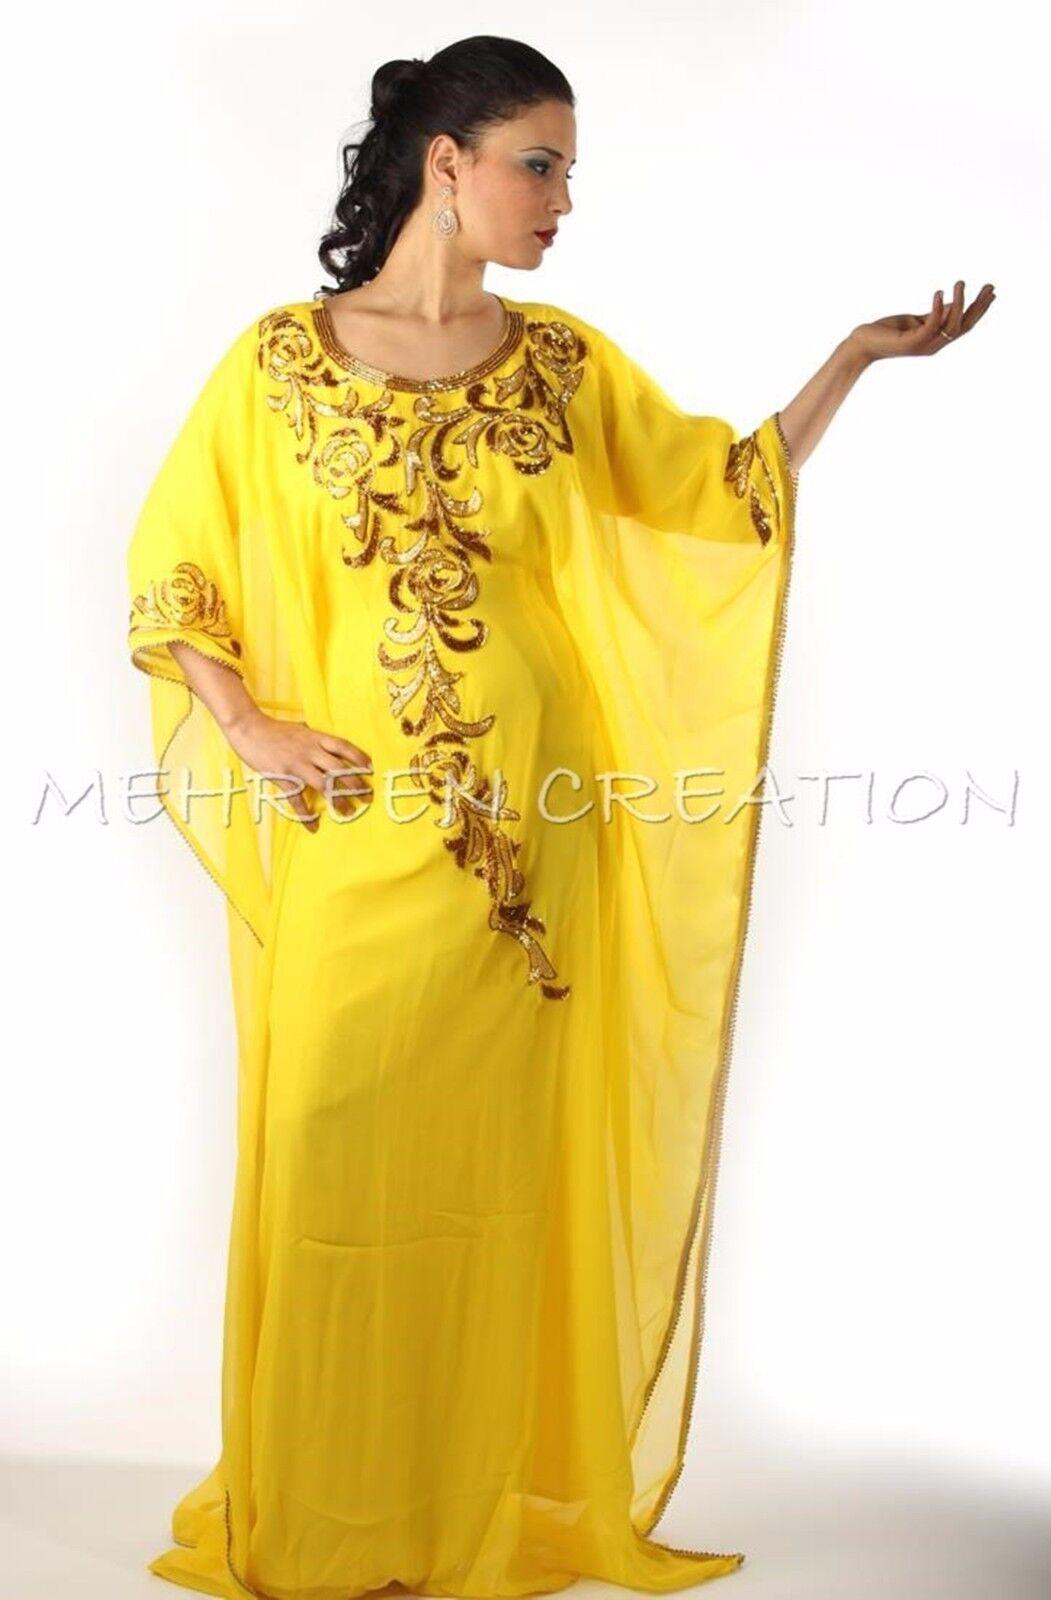 DUBAI VESTIDO ELEGANT HAND MADE MgoldCCAN FOR WOMEN CLOTHING CLOTHING CLOTHING EDH 797 9c2fce